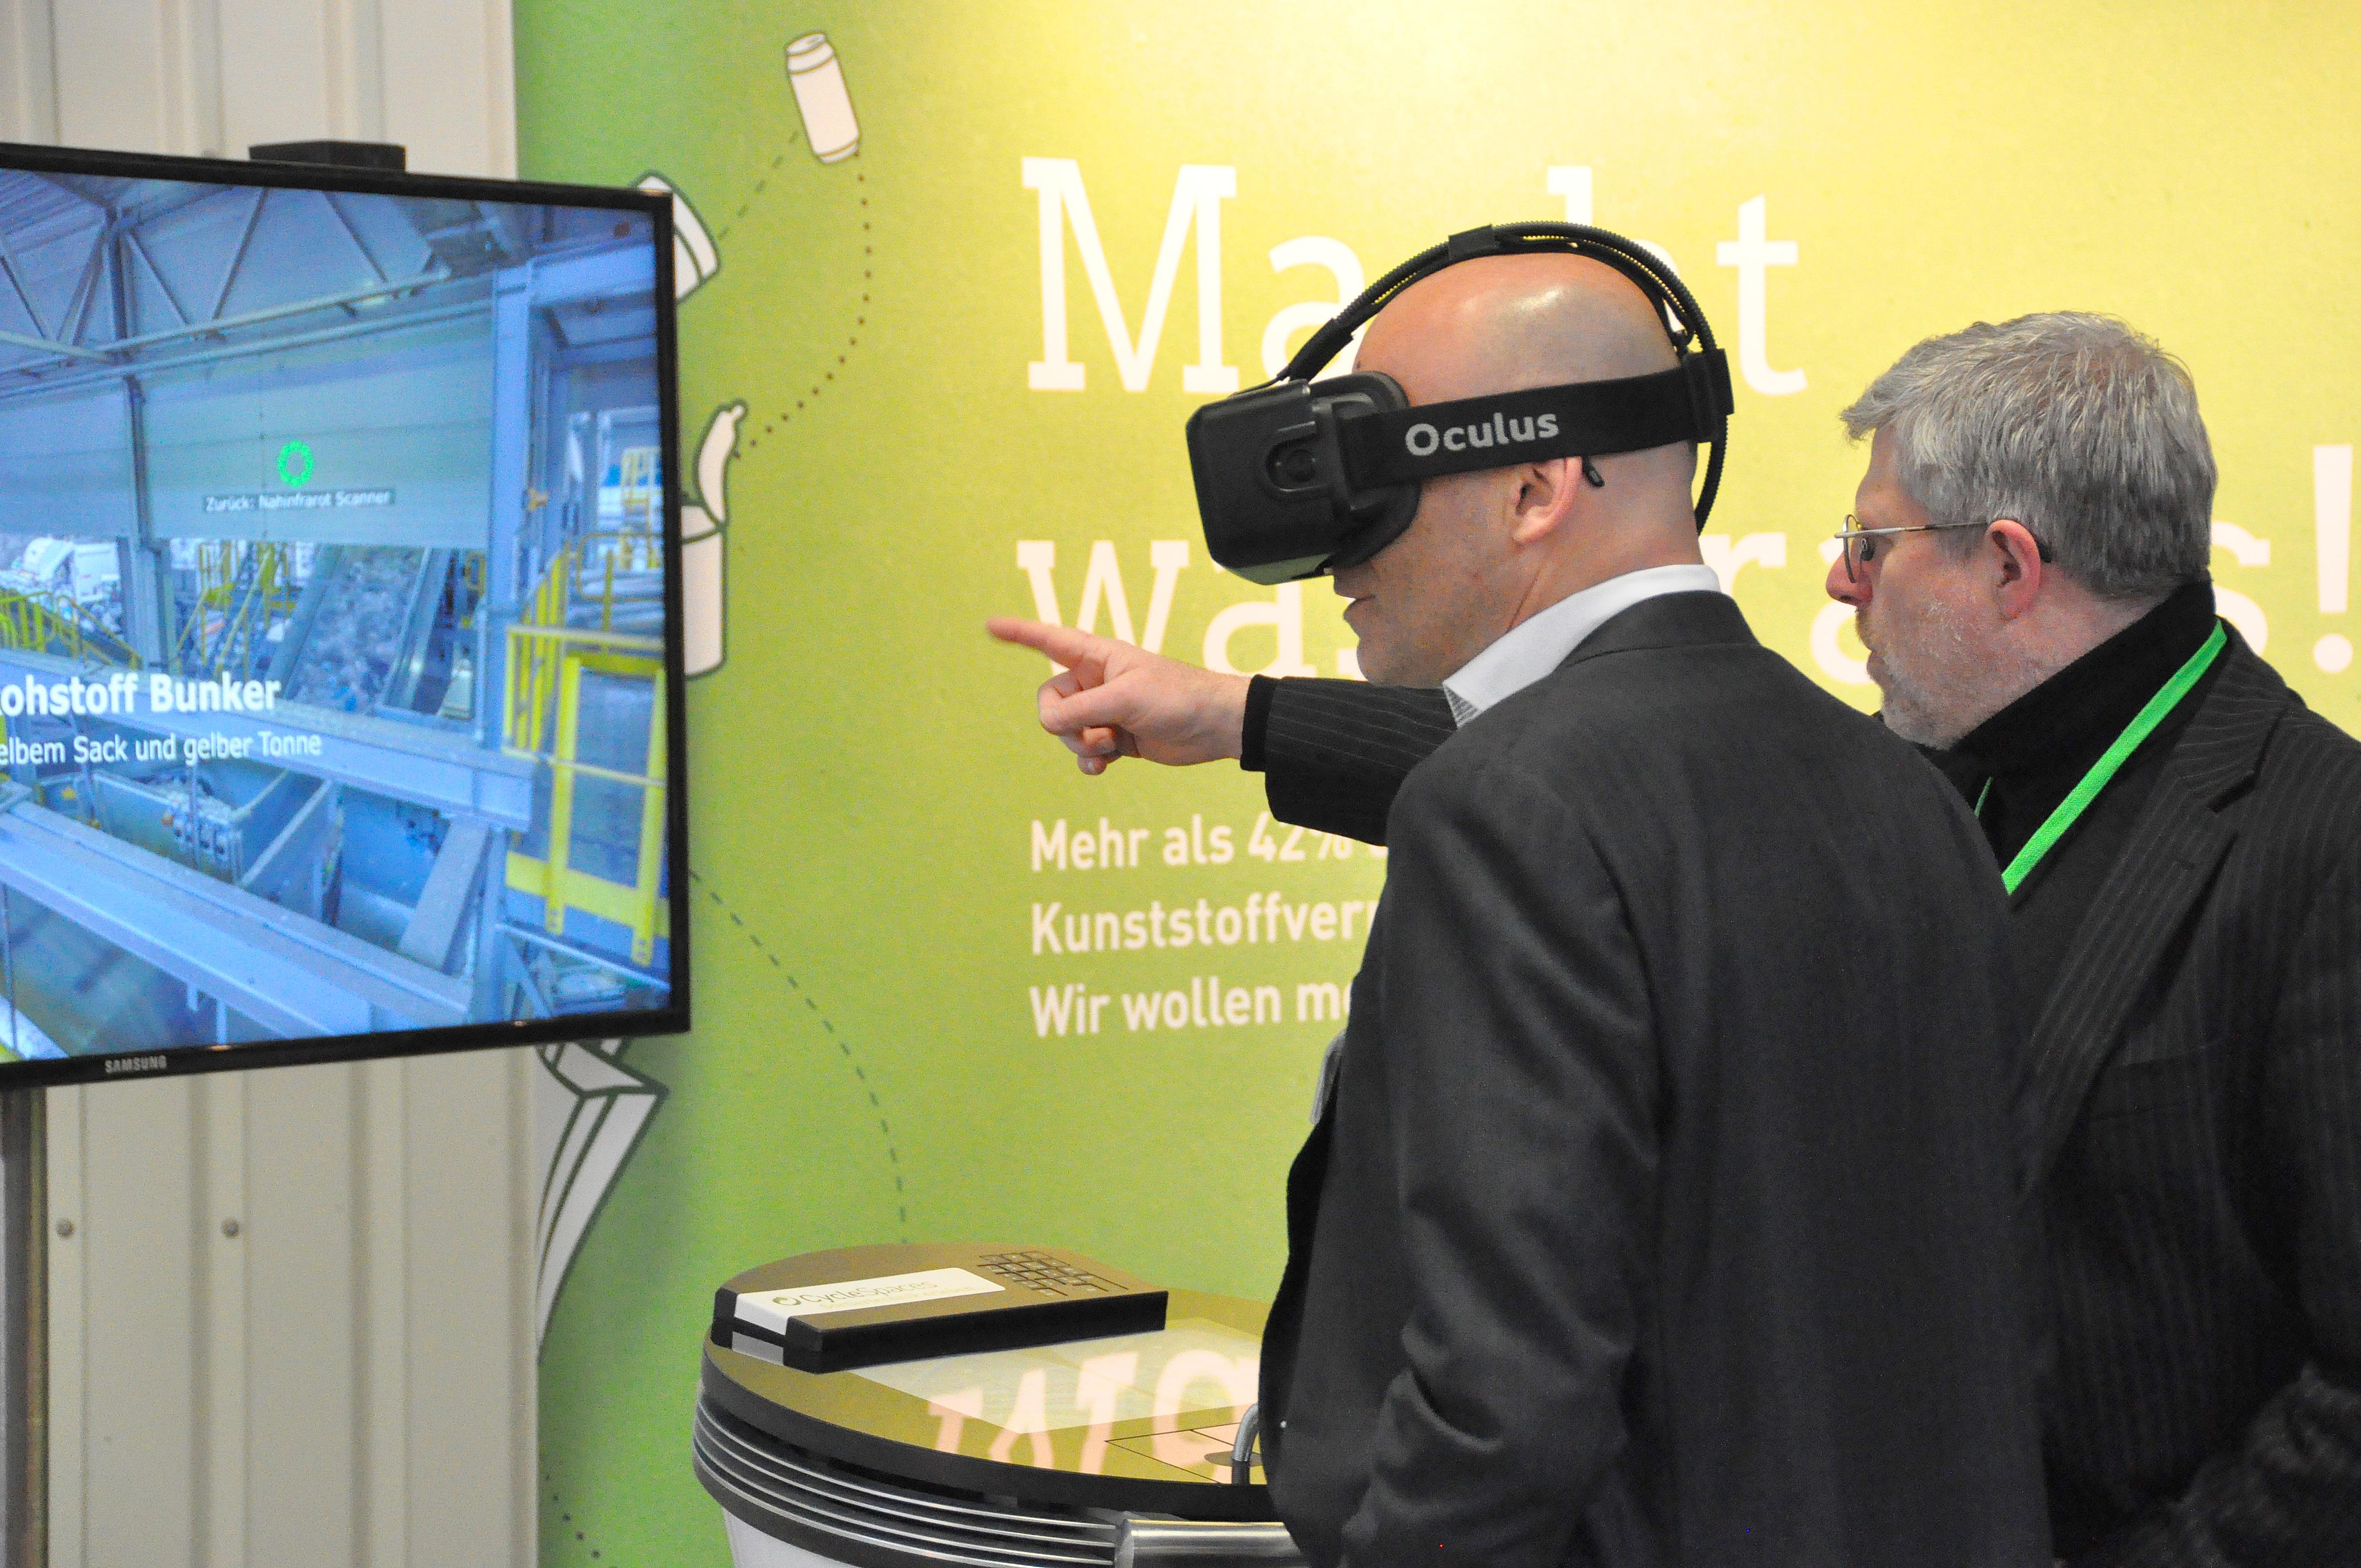 Executives get deep insight into technologies